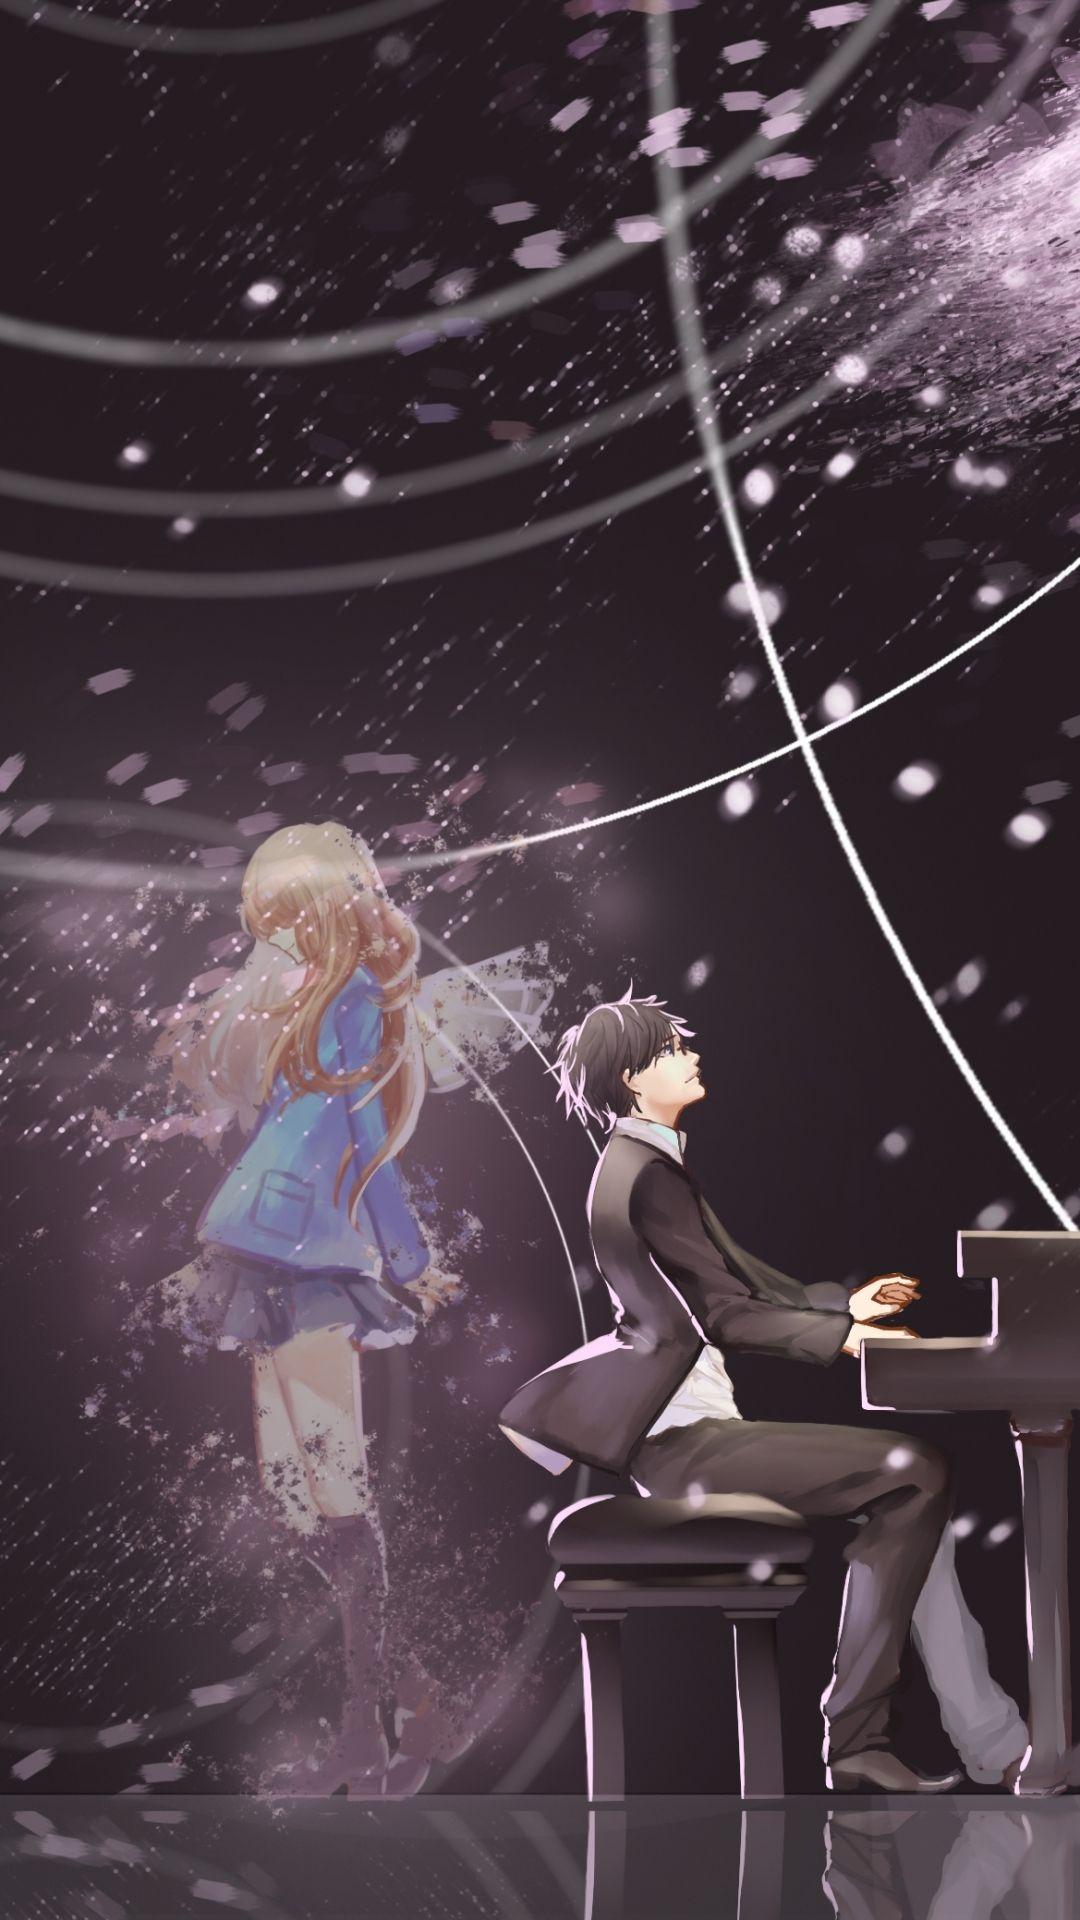 Anime couple, manga couple, beautiful night Star art